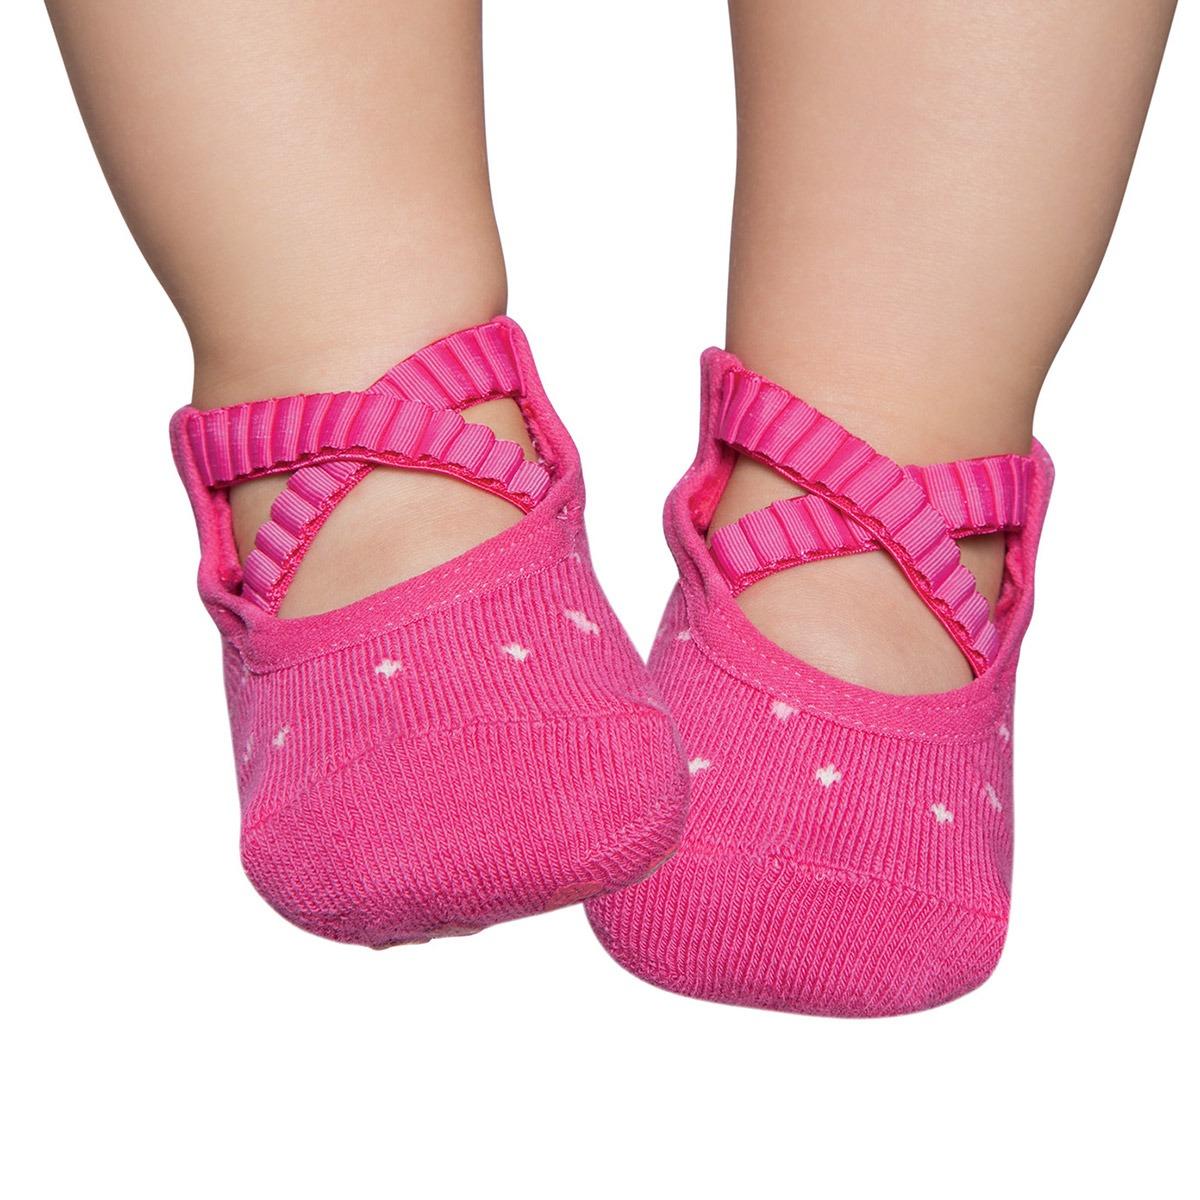 739a7eb710 meia sapatilha para bebe ballet pink - puket. Carregando zoom.